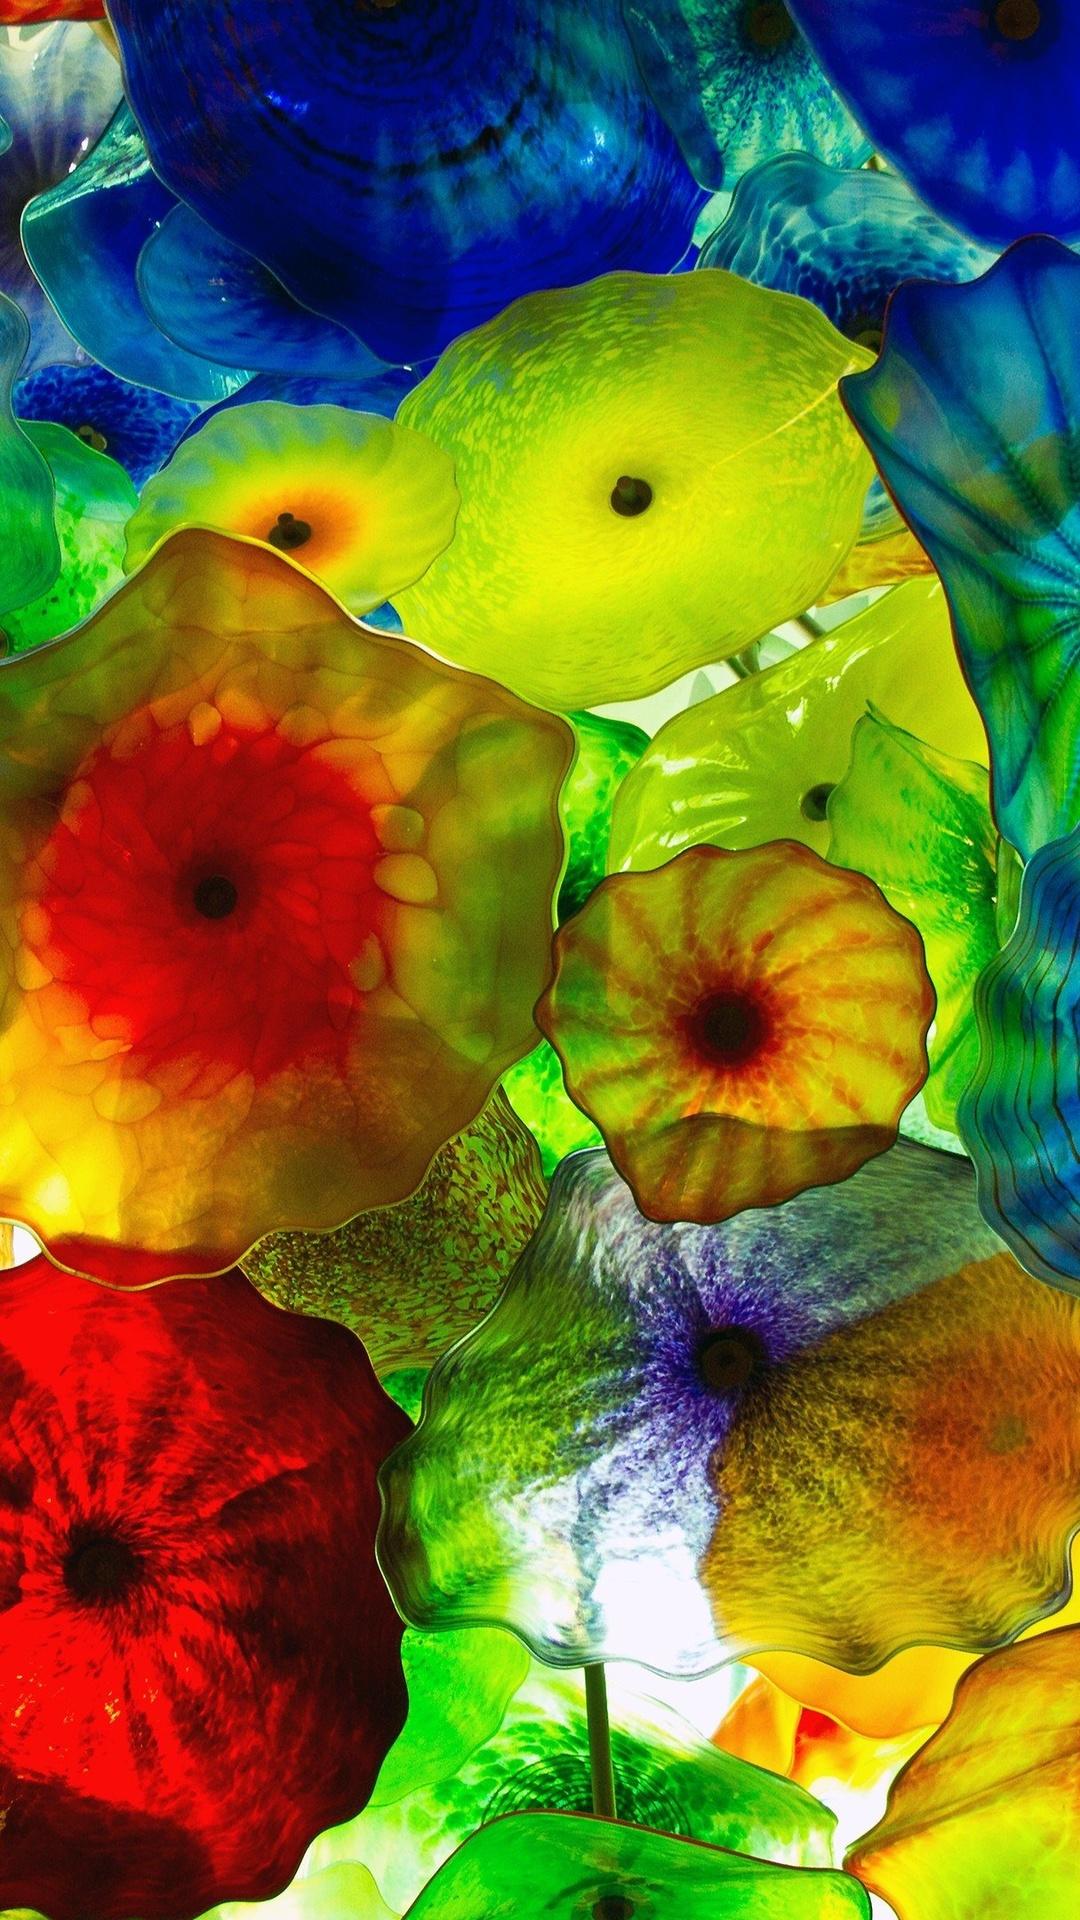 4k Wallpaper Tropical Related Keywords Suggestions   4k Wallpaper 1080x1920